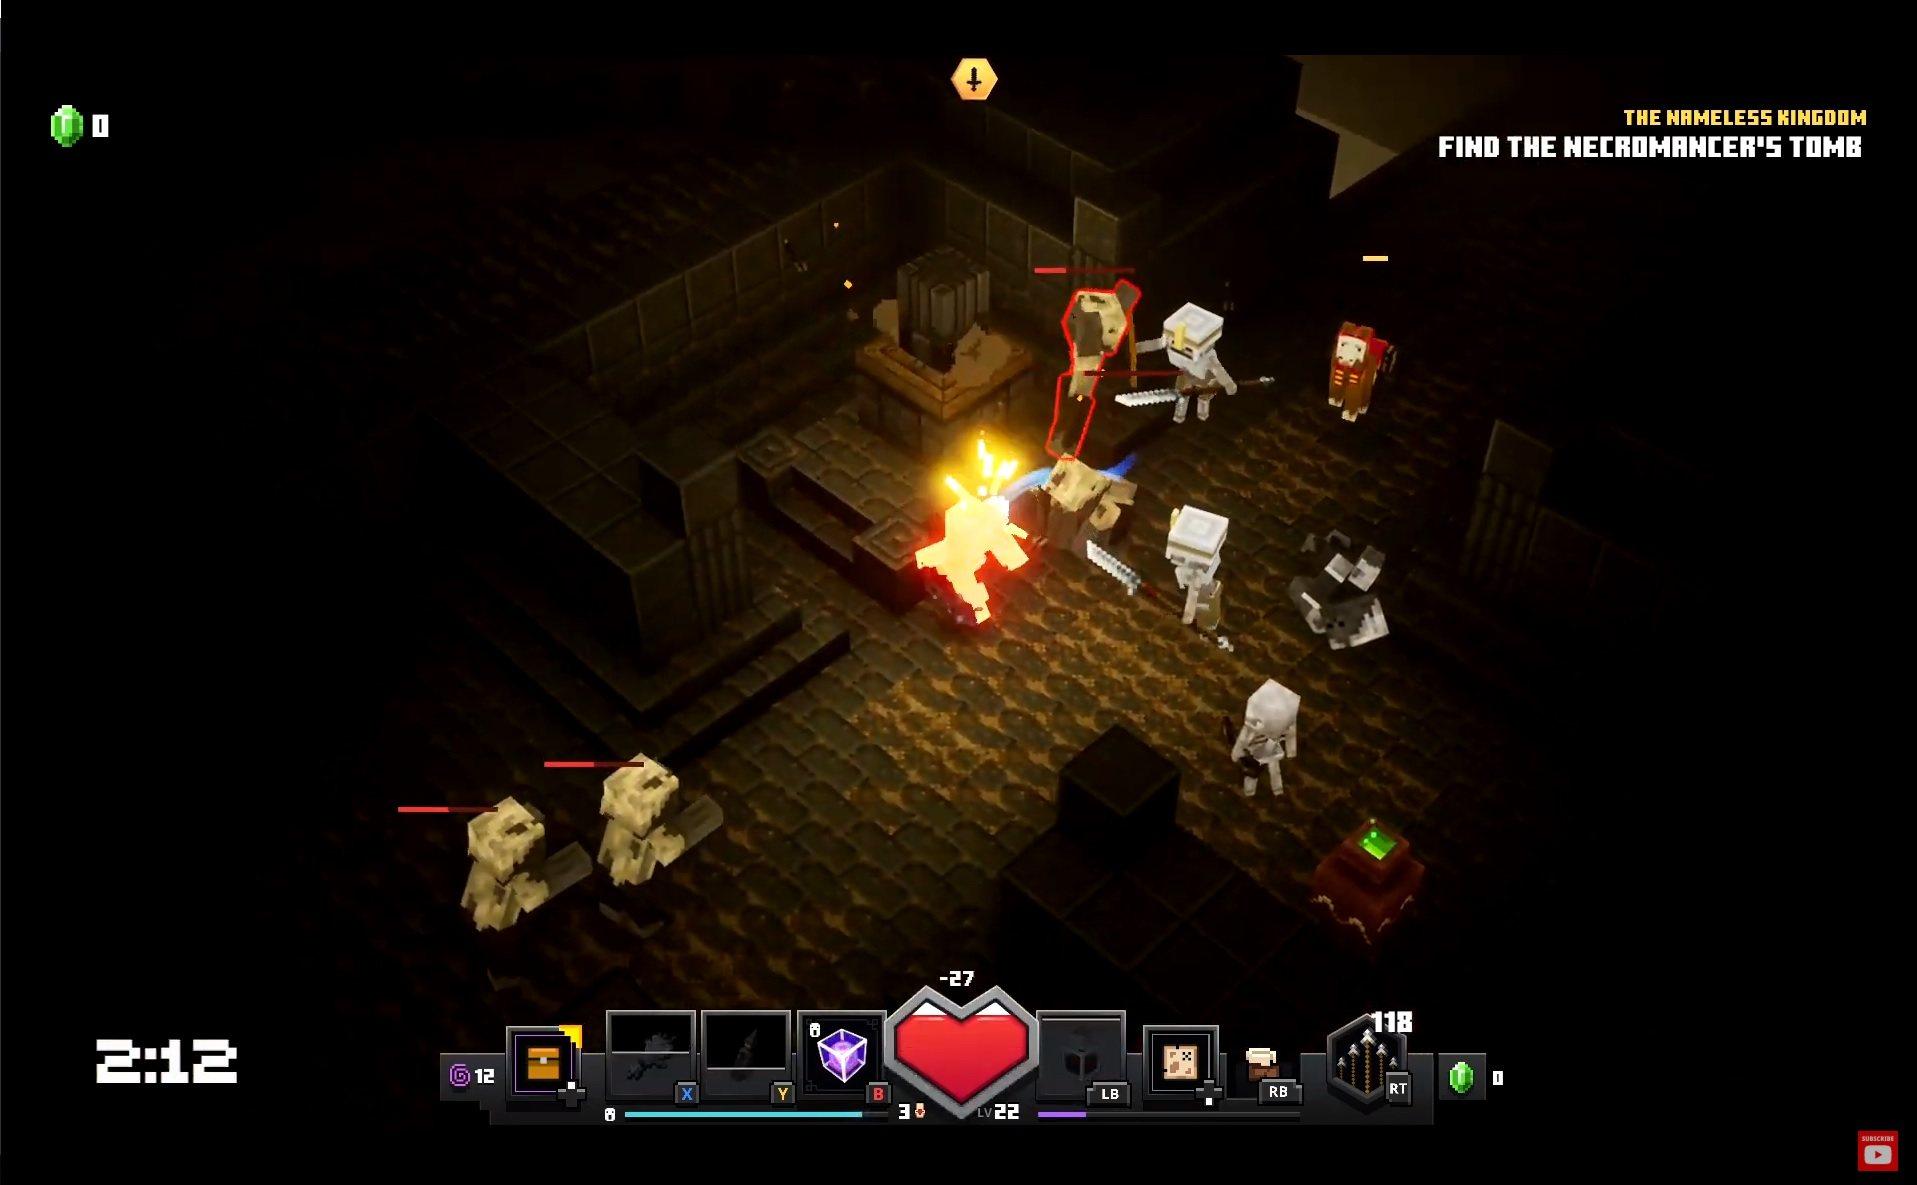 minecraft dungeons gamelay demo rozgrywka 2